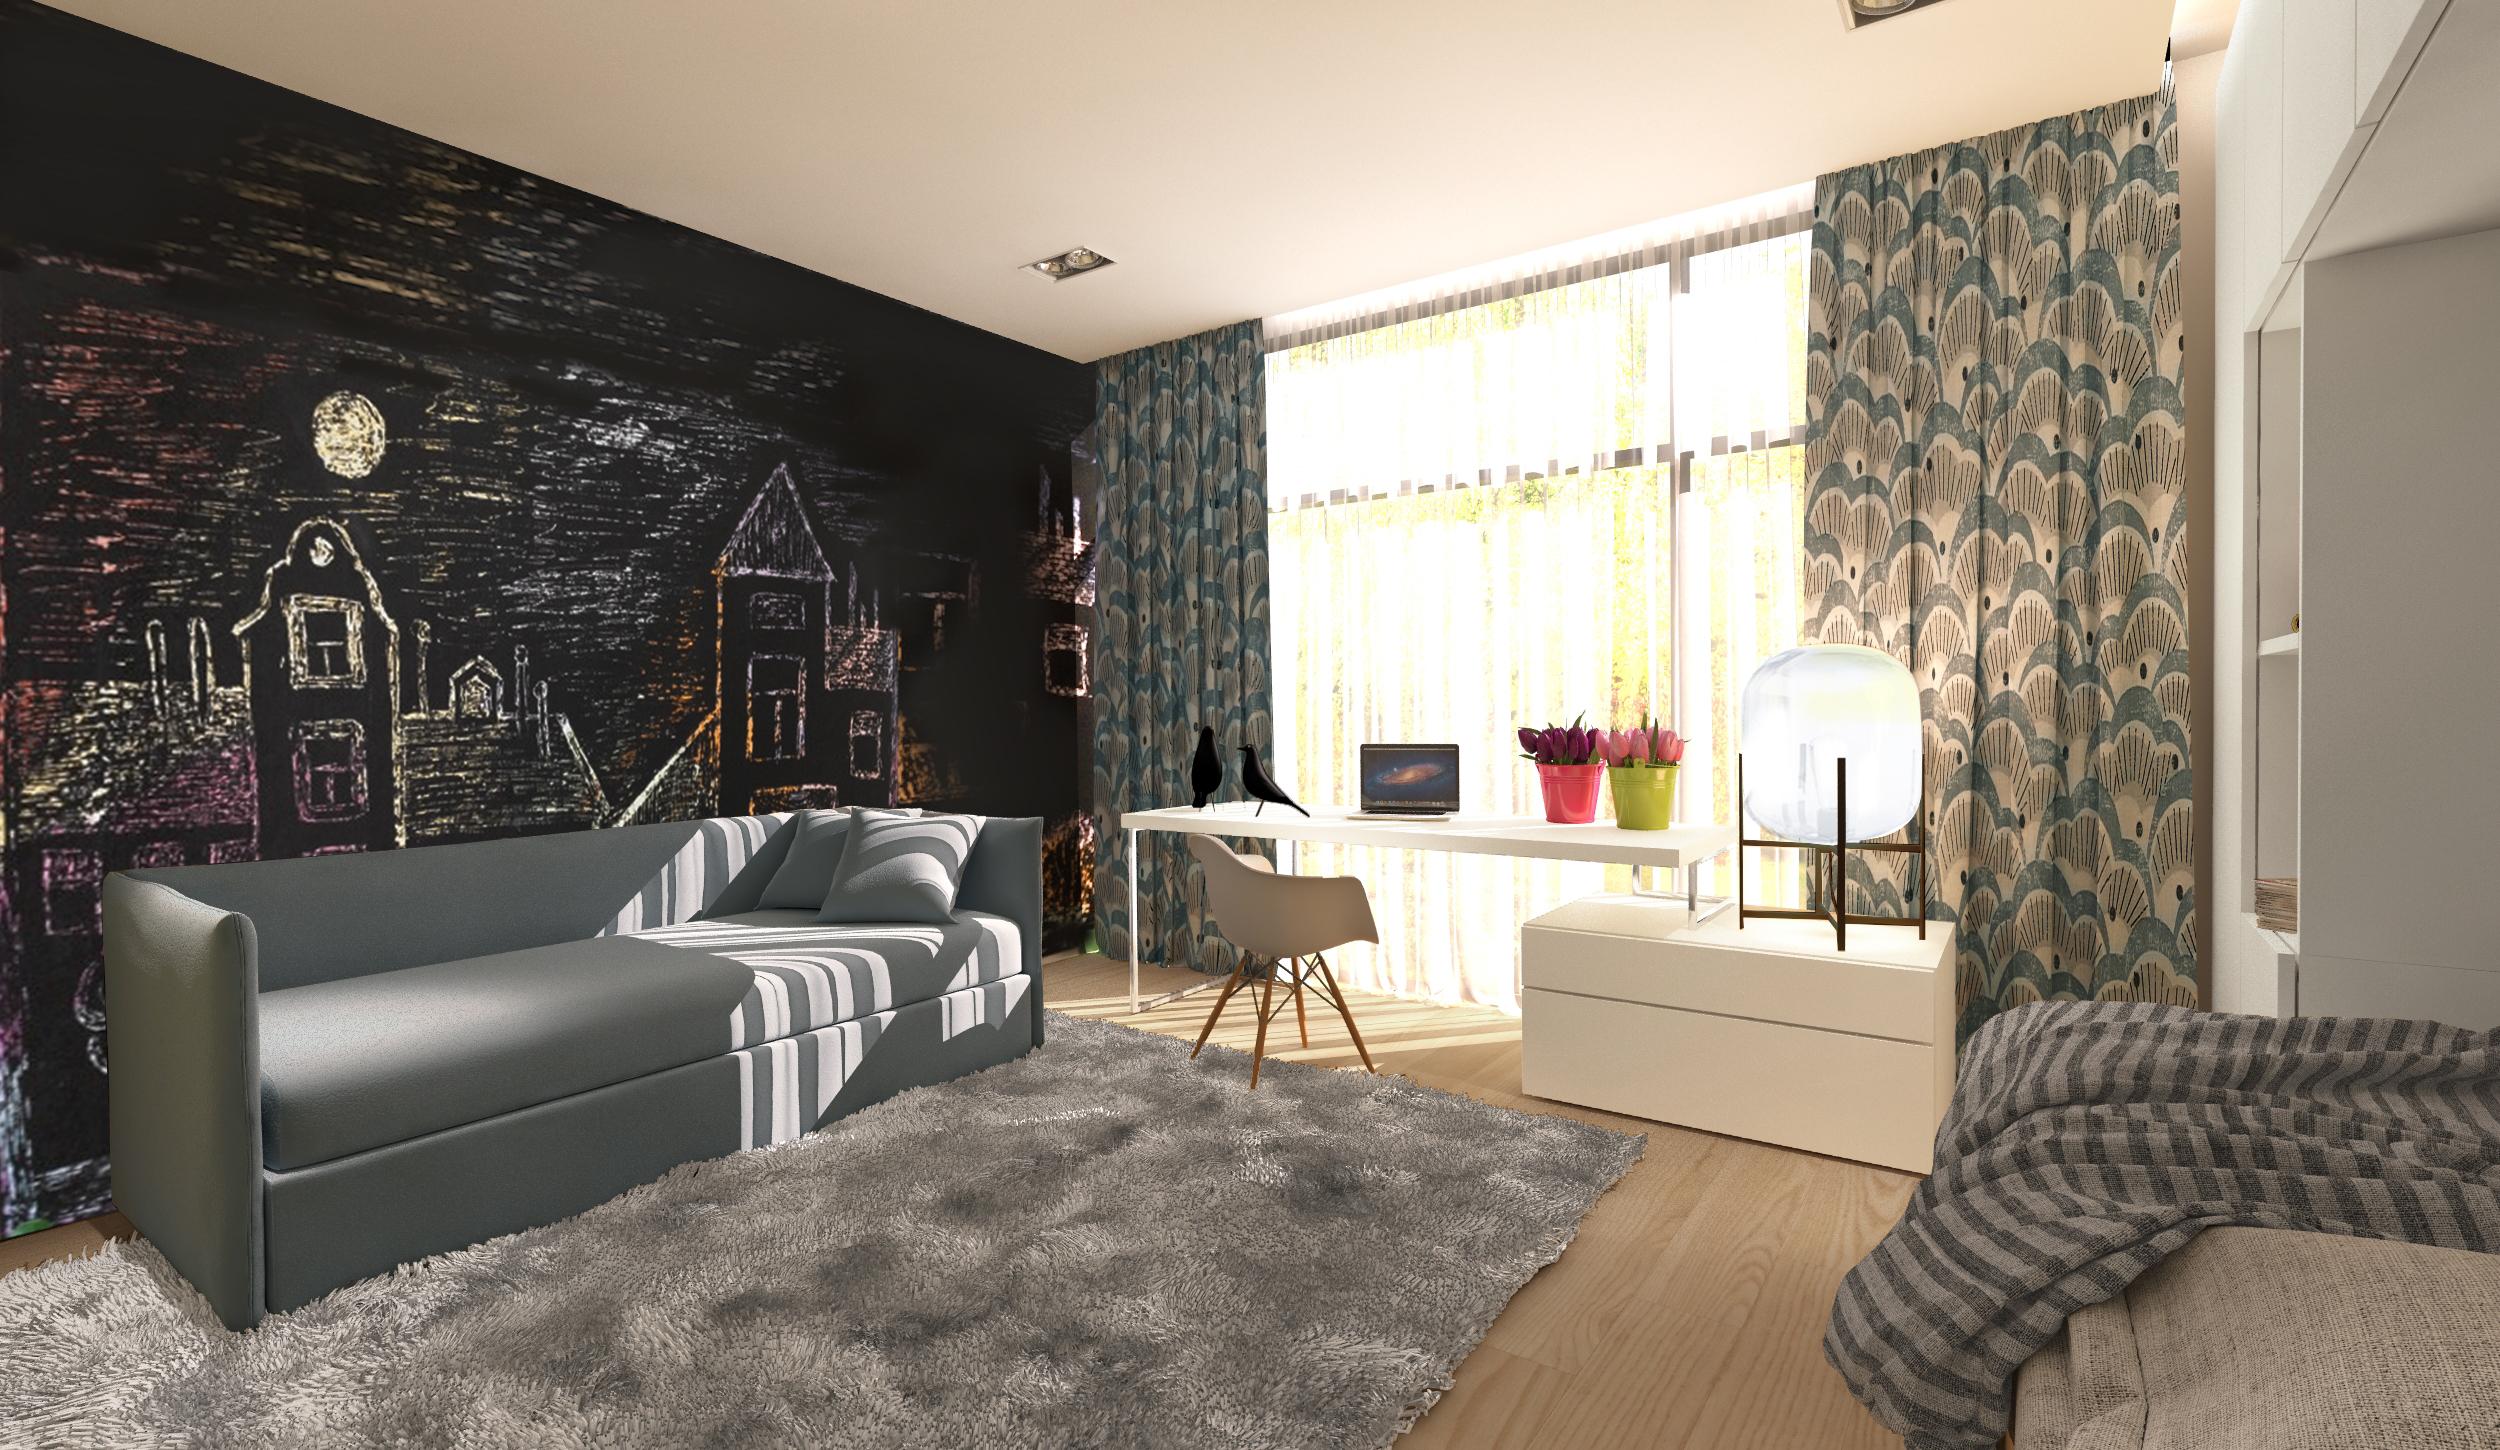 15_Match Architects_Барвиха_детская спальня.jpg